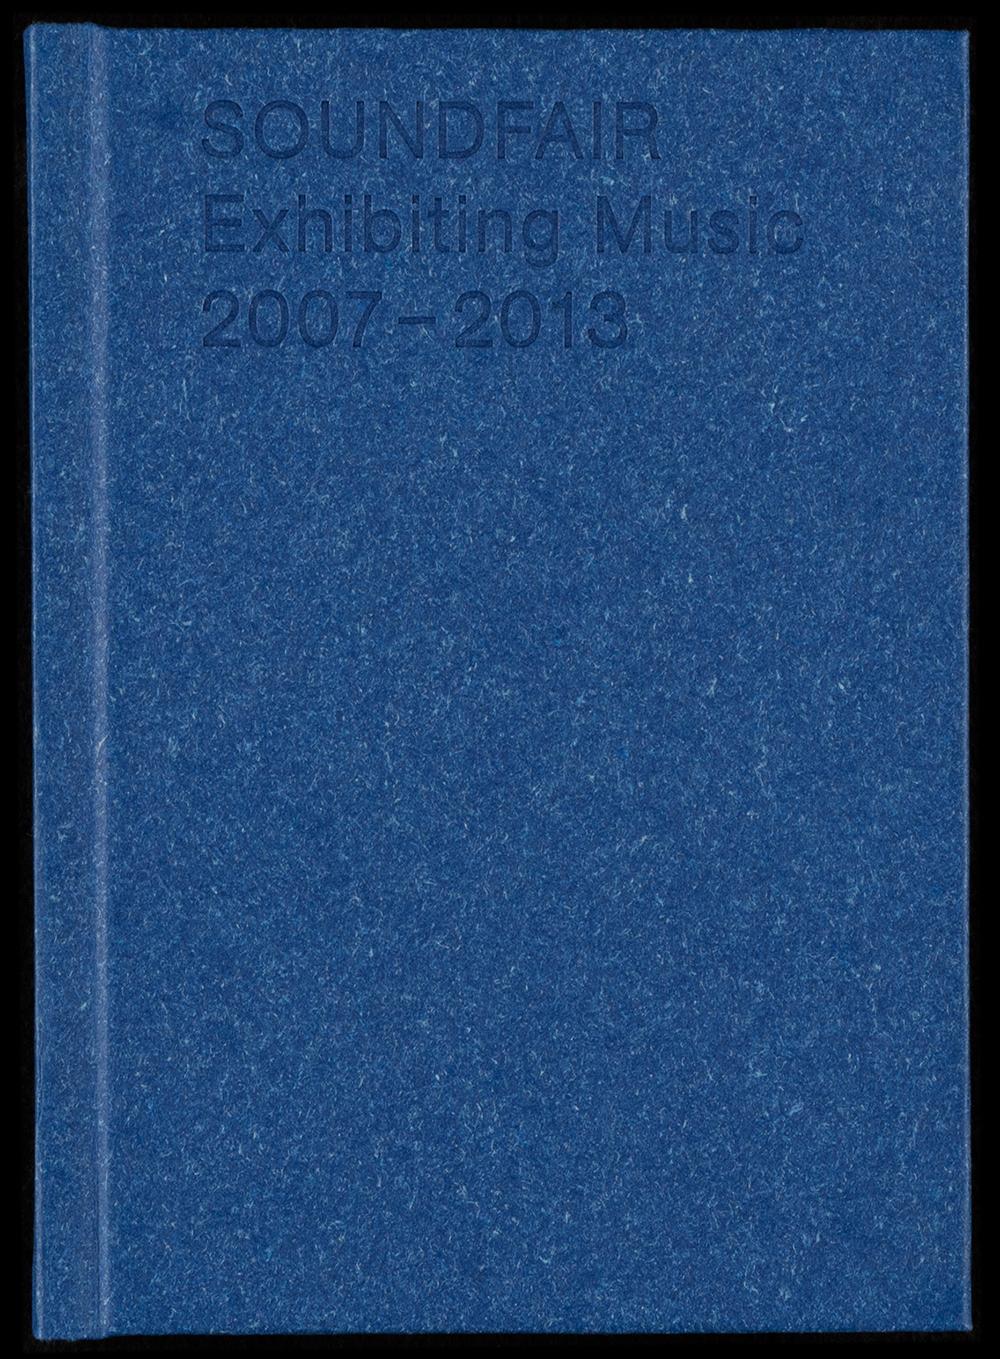 Soundfair-Thomas-Mayer